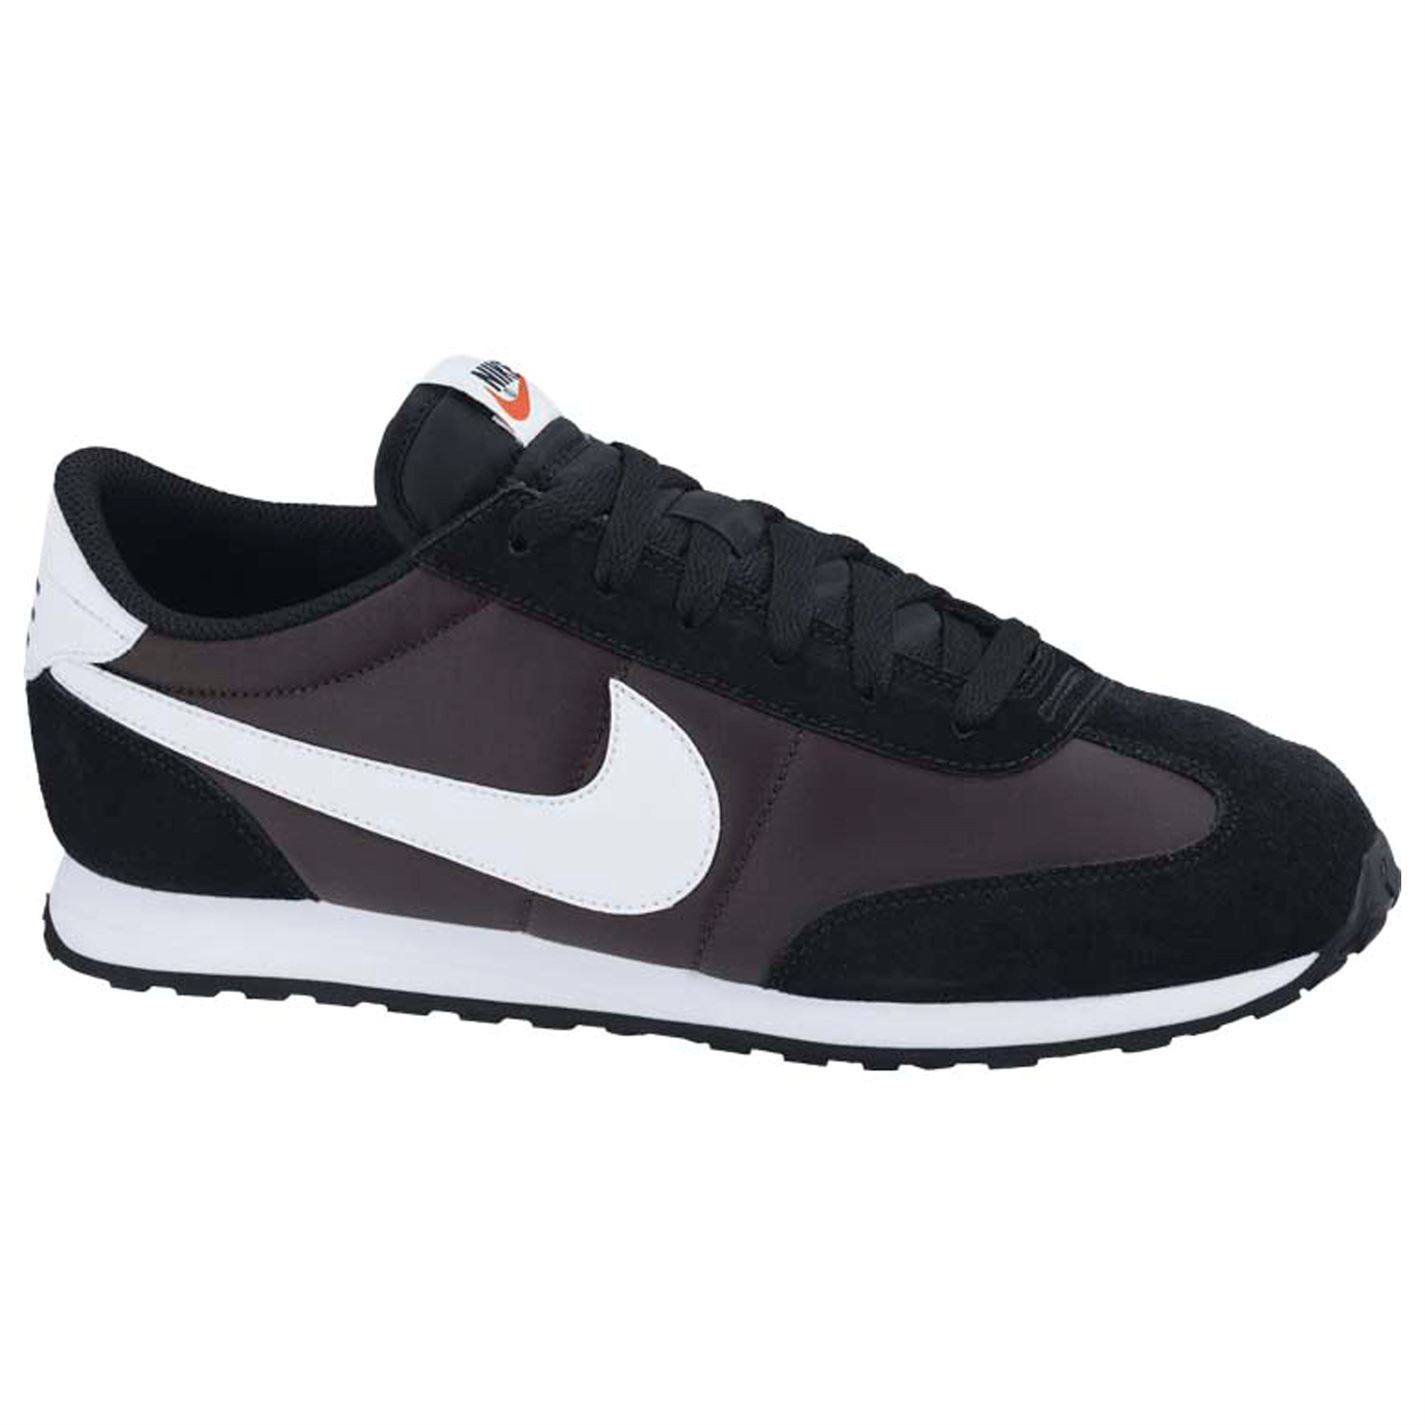 scarpe di separazione a52da 501c9 Dettagli su Nike Mach da Corsa Scarpe Sportive Uomo Athleisure Scarpe  Scarpe Sportive